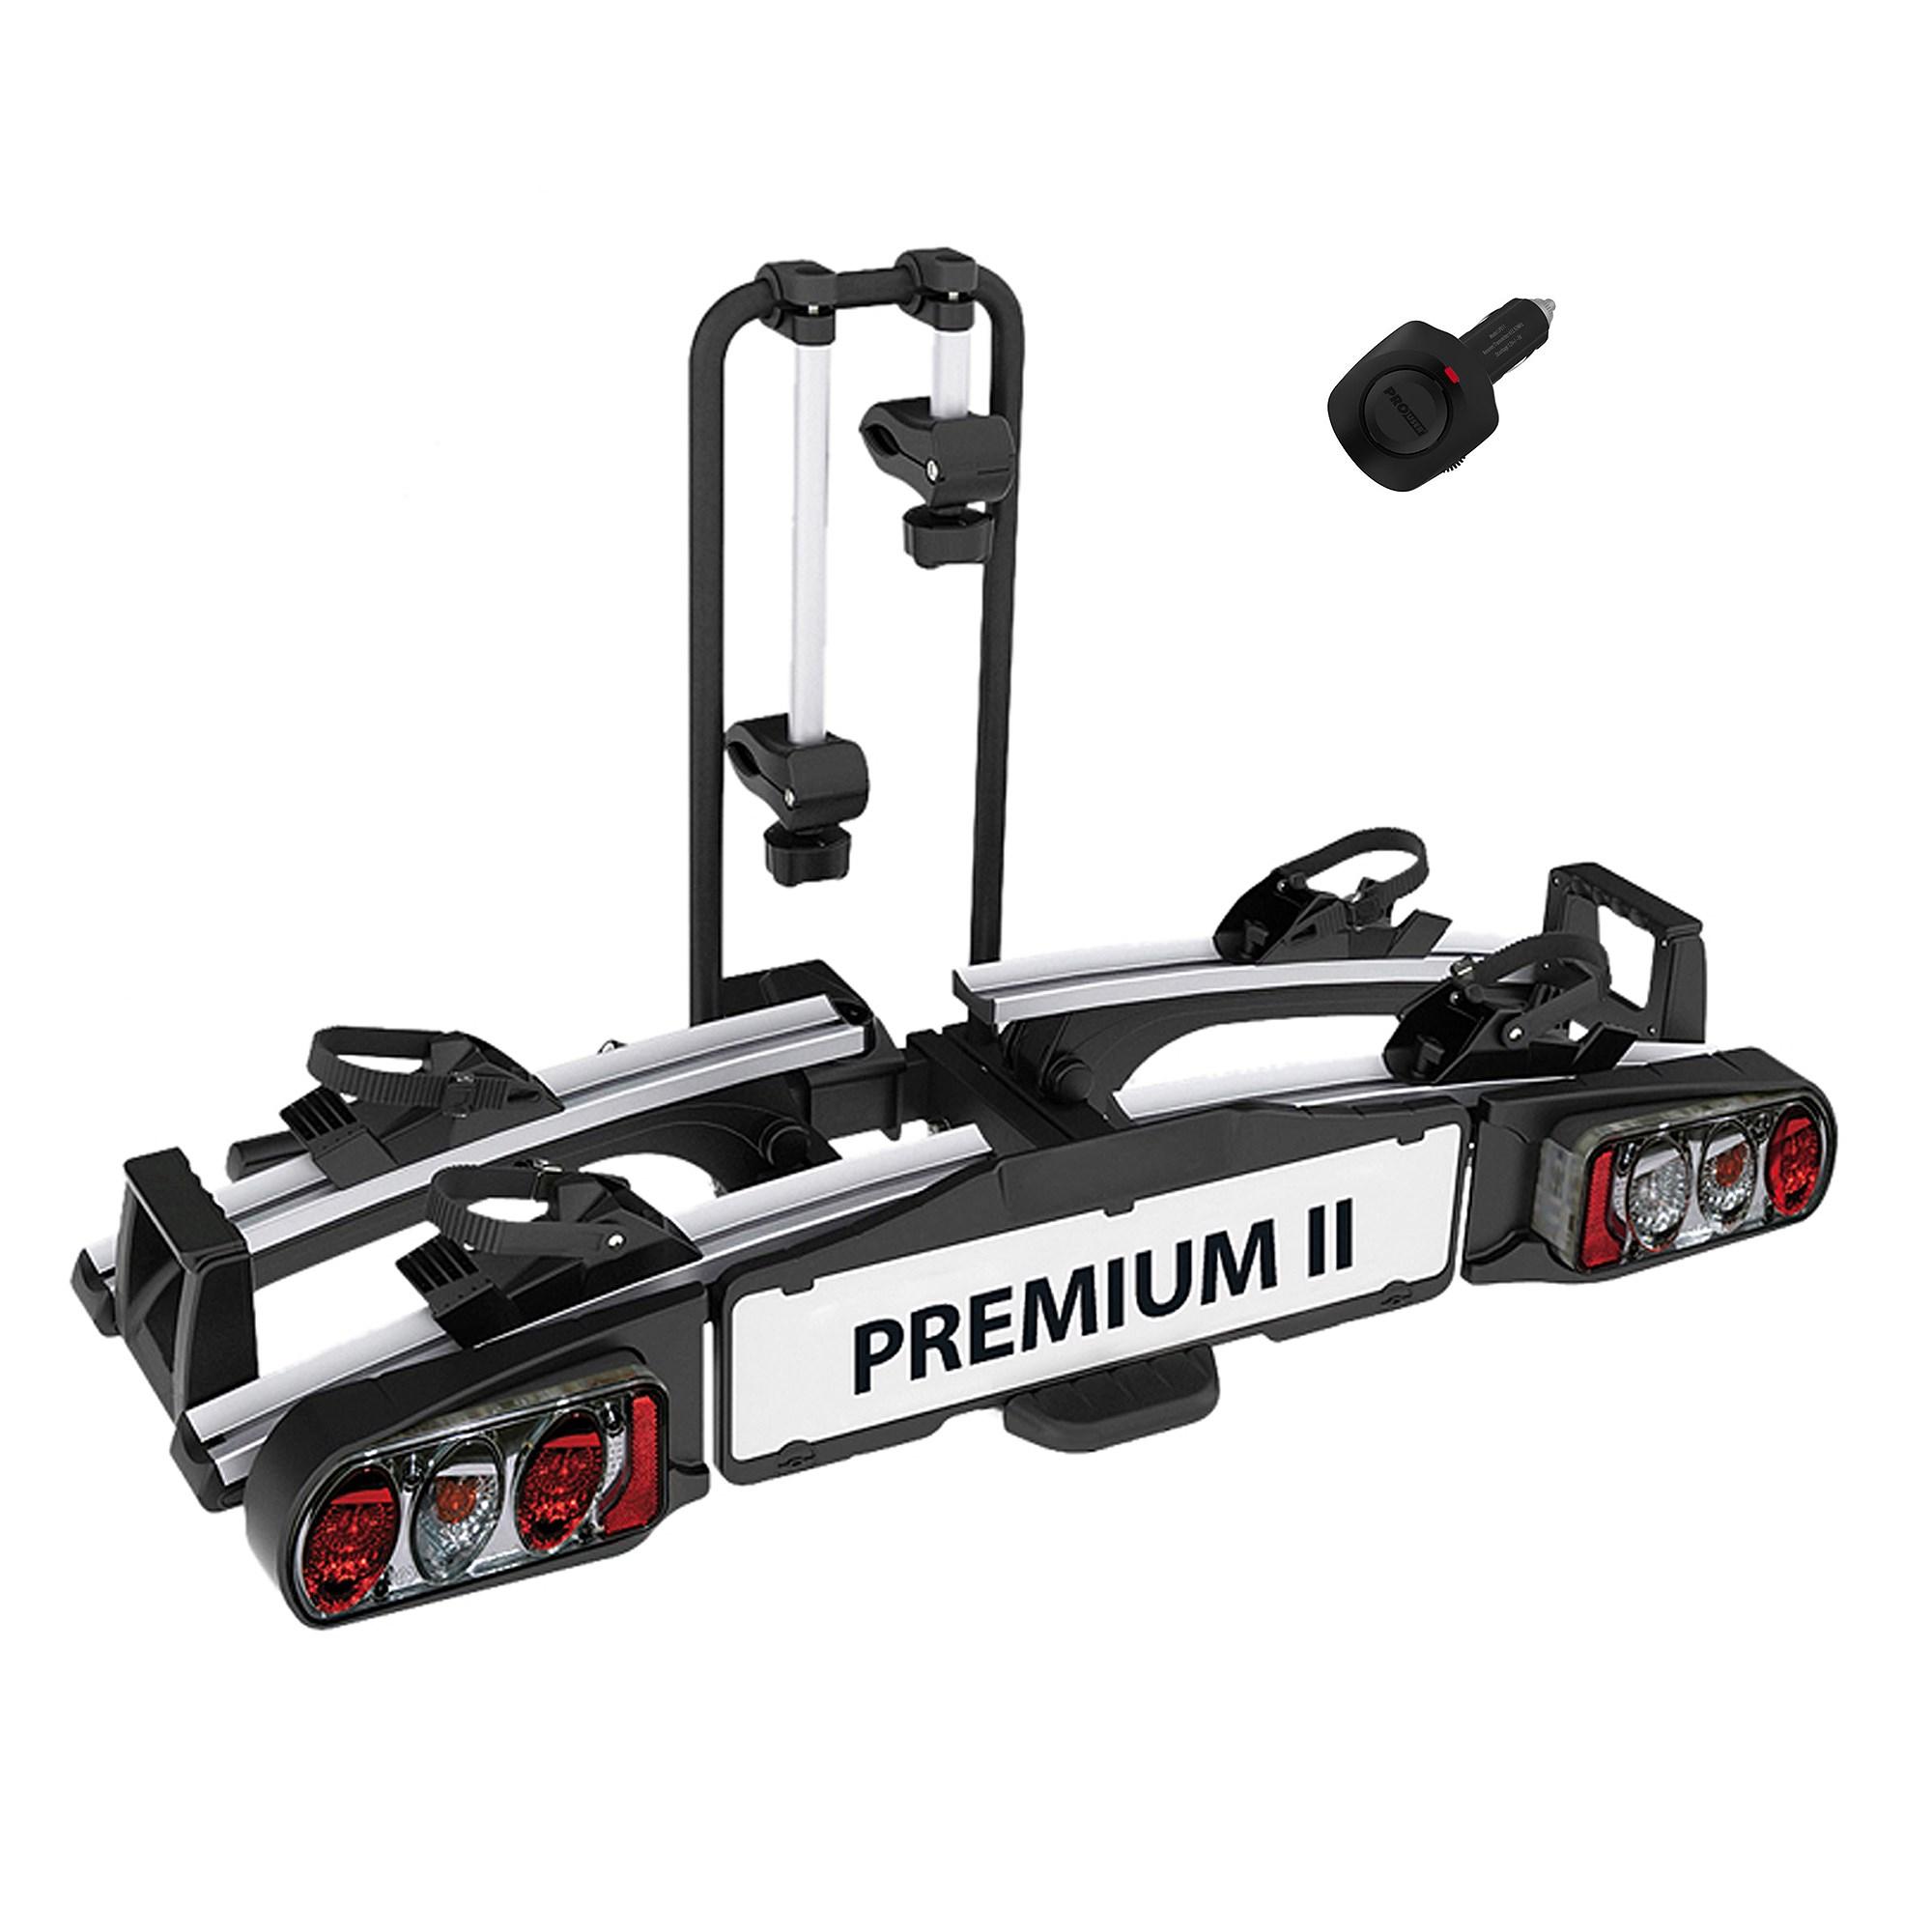 eufab premium ii fahrradtr ger ahk einparkhilfe atp. Black Bedroom Furniture Sets. Home Design Ideas